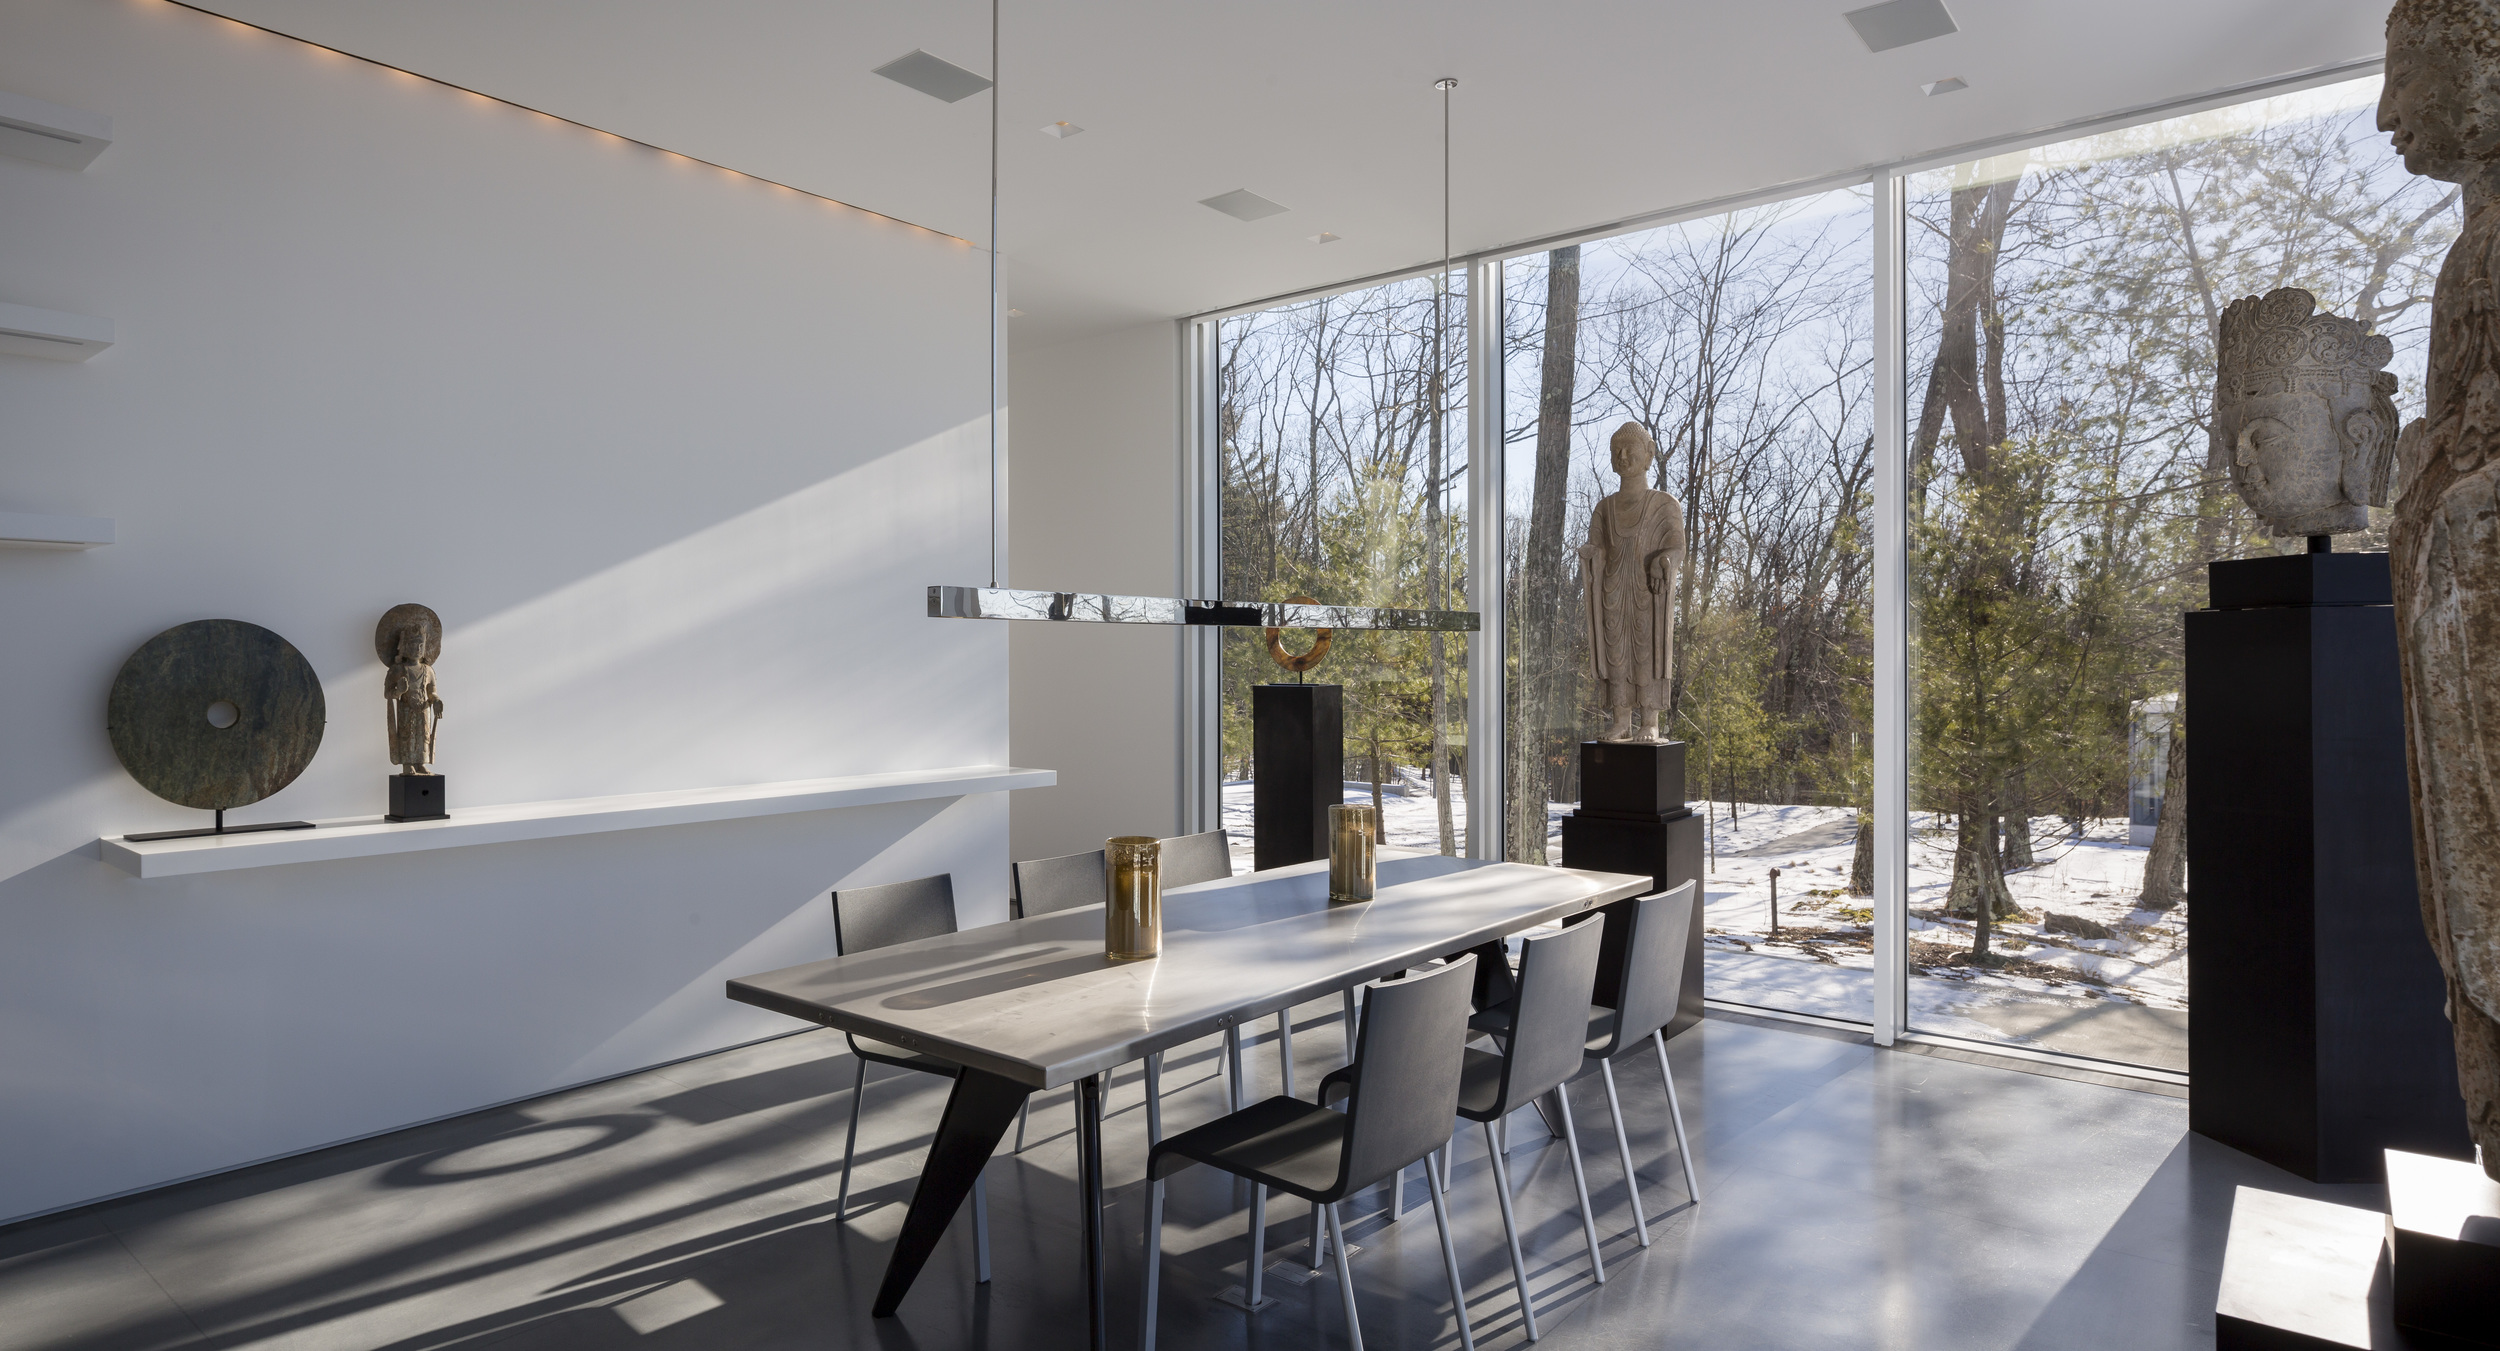 Toshiko Mori new york house interior